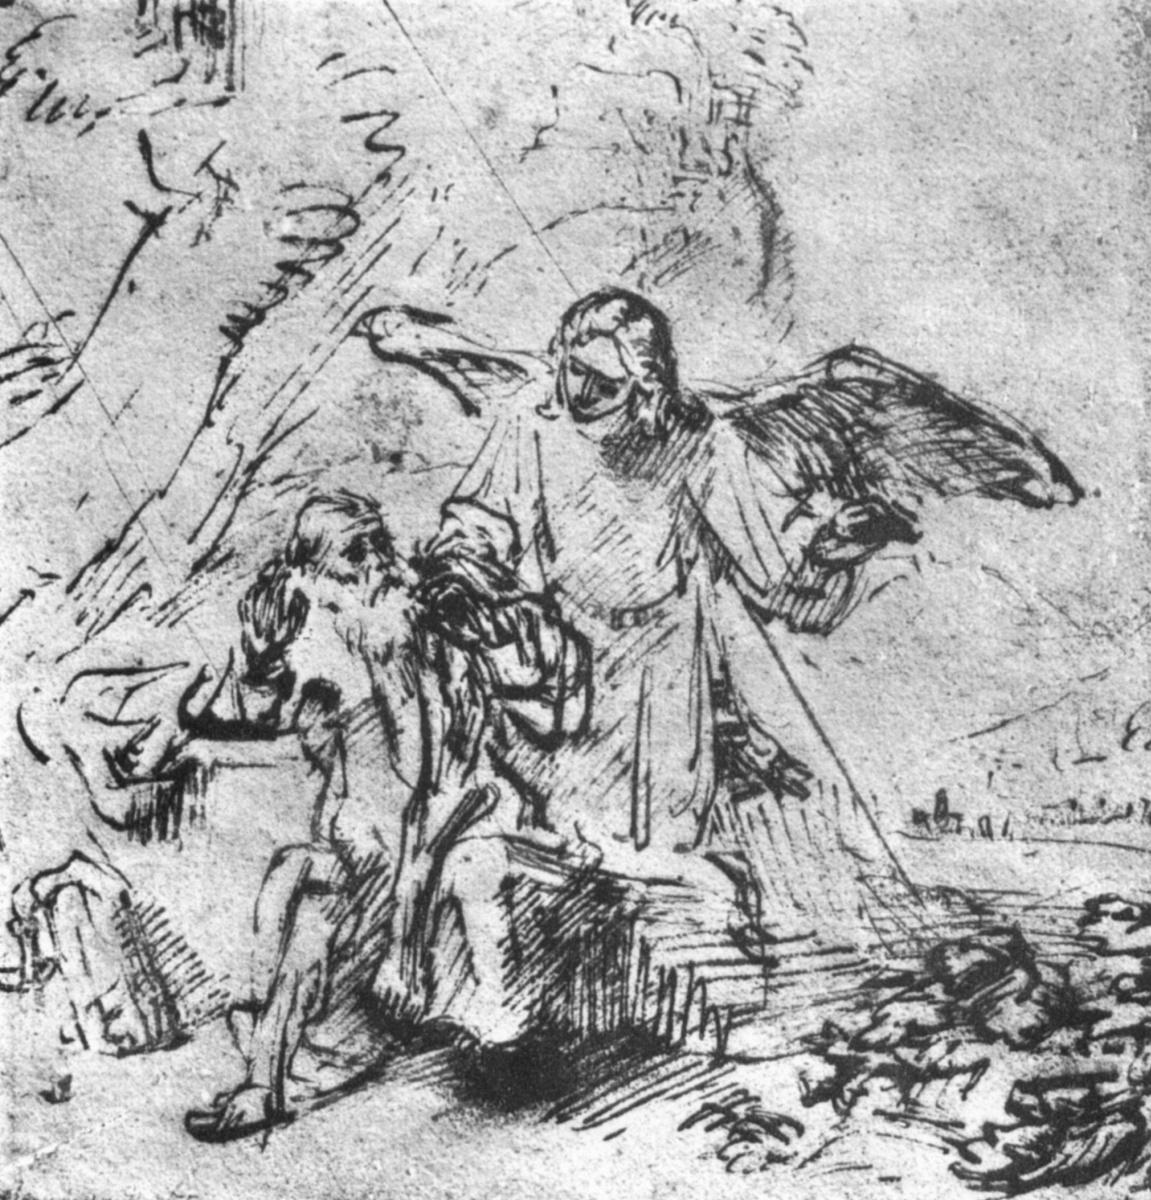 Рембрандт Харменс ван Рейн. Илия и ангел в пустыне